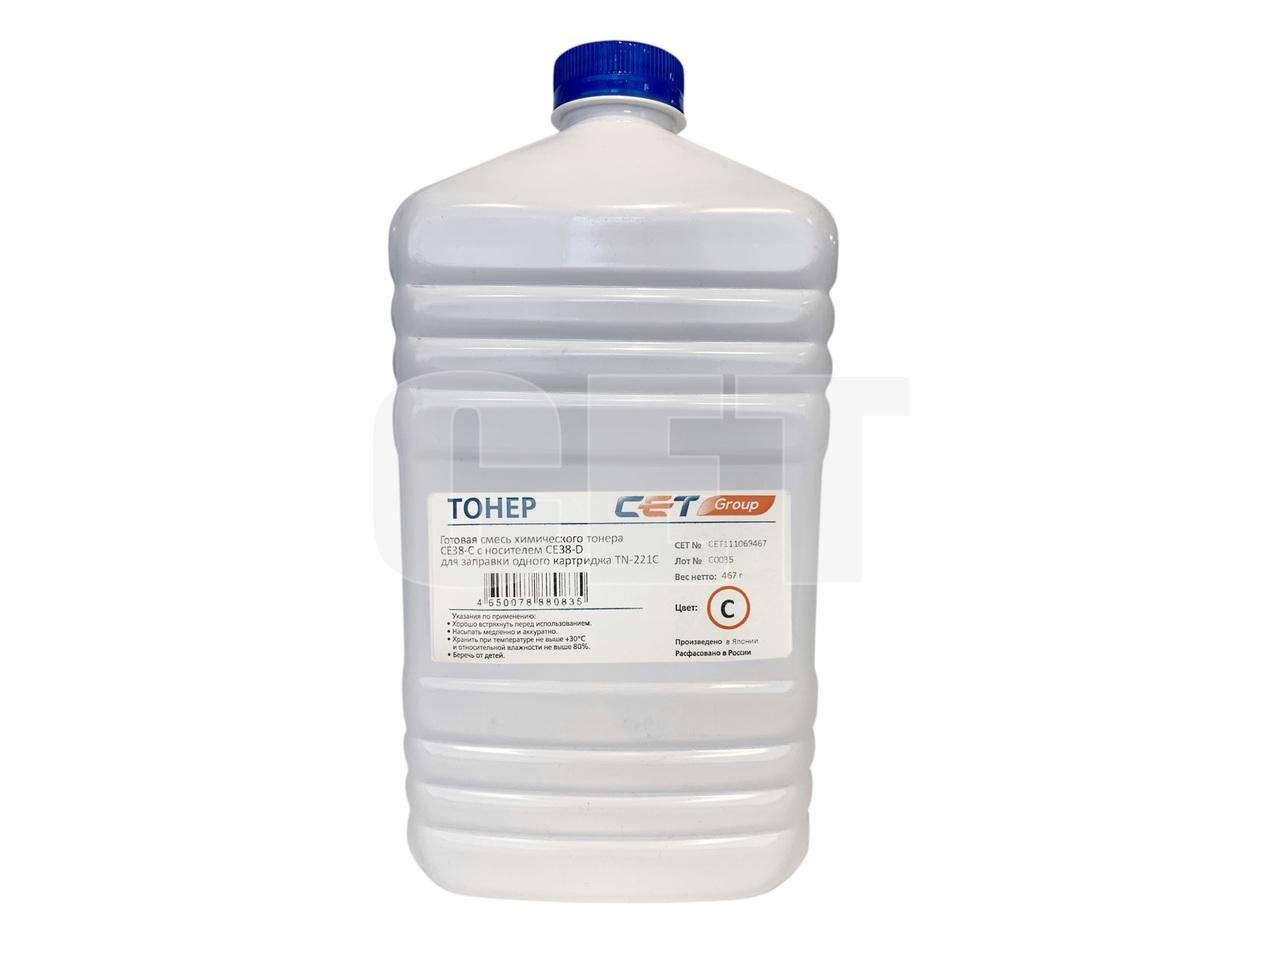 Тонер CE38-C (CPT) TN-221C для KONICA MINOLTA BizhubC227/287 (Japan) Cyan, 467г/бут, CET111069467